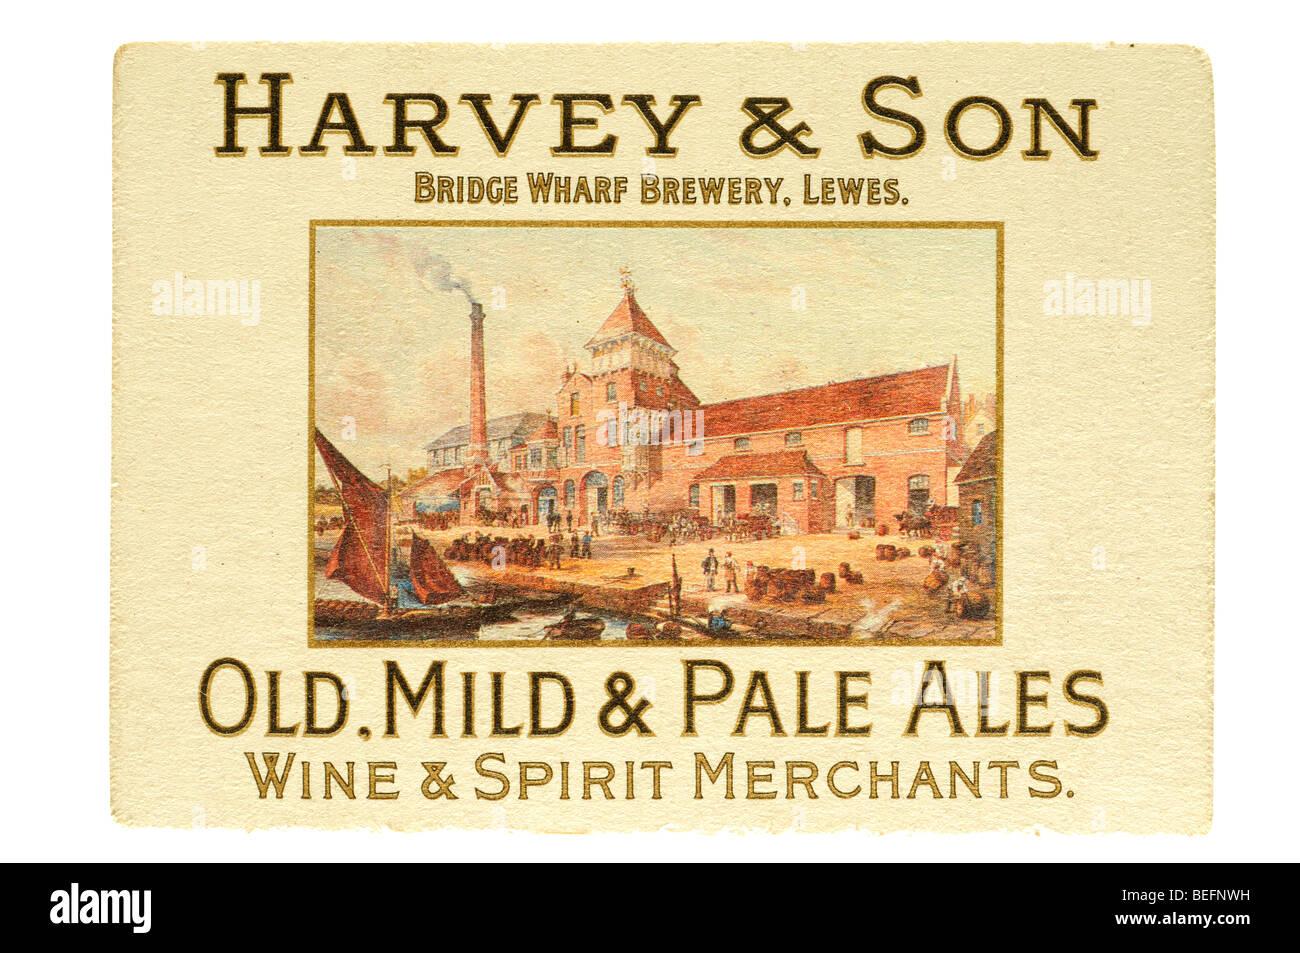 harvey & son bridge wharf brewery lewes old mild & pale ales Wine & spirit merchants - Stock Image